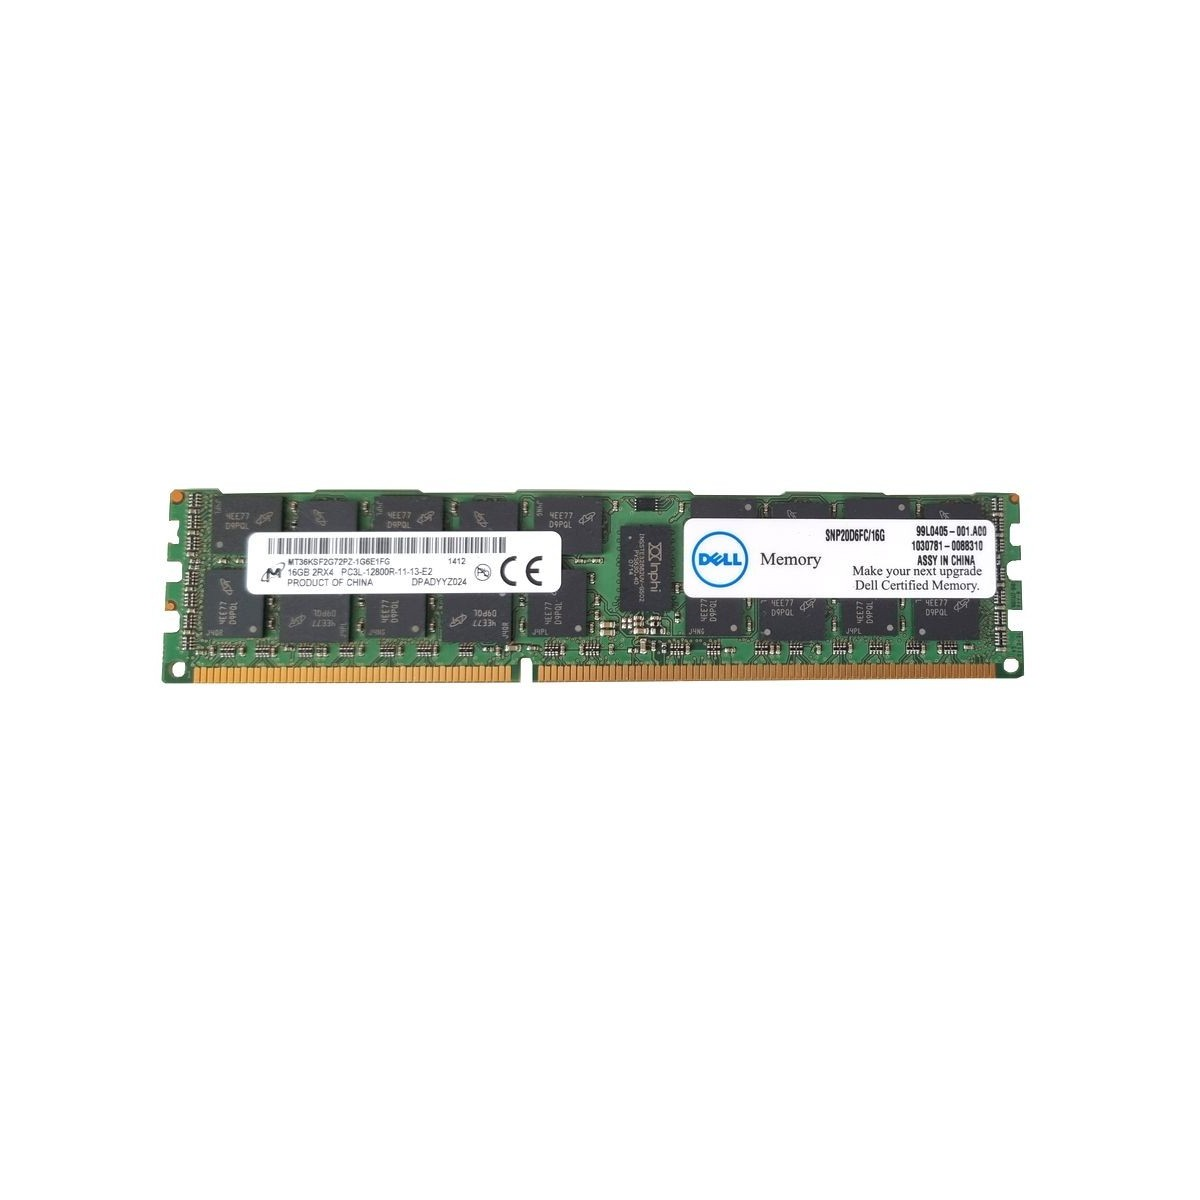 HP SMART ARRAY P420 1GB CACHE BATTERY 633539-001